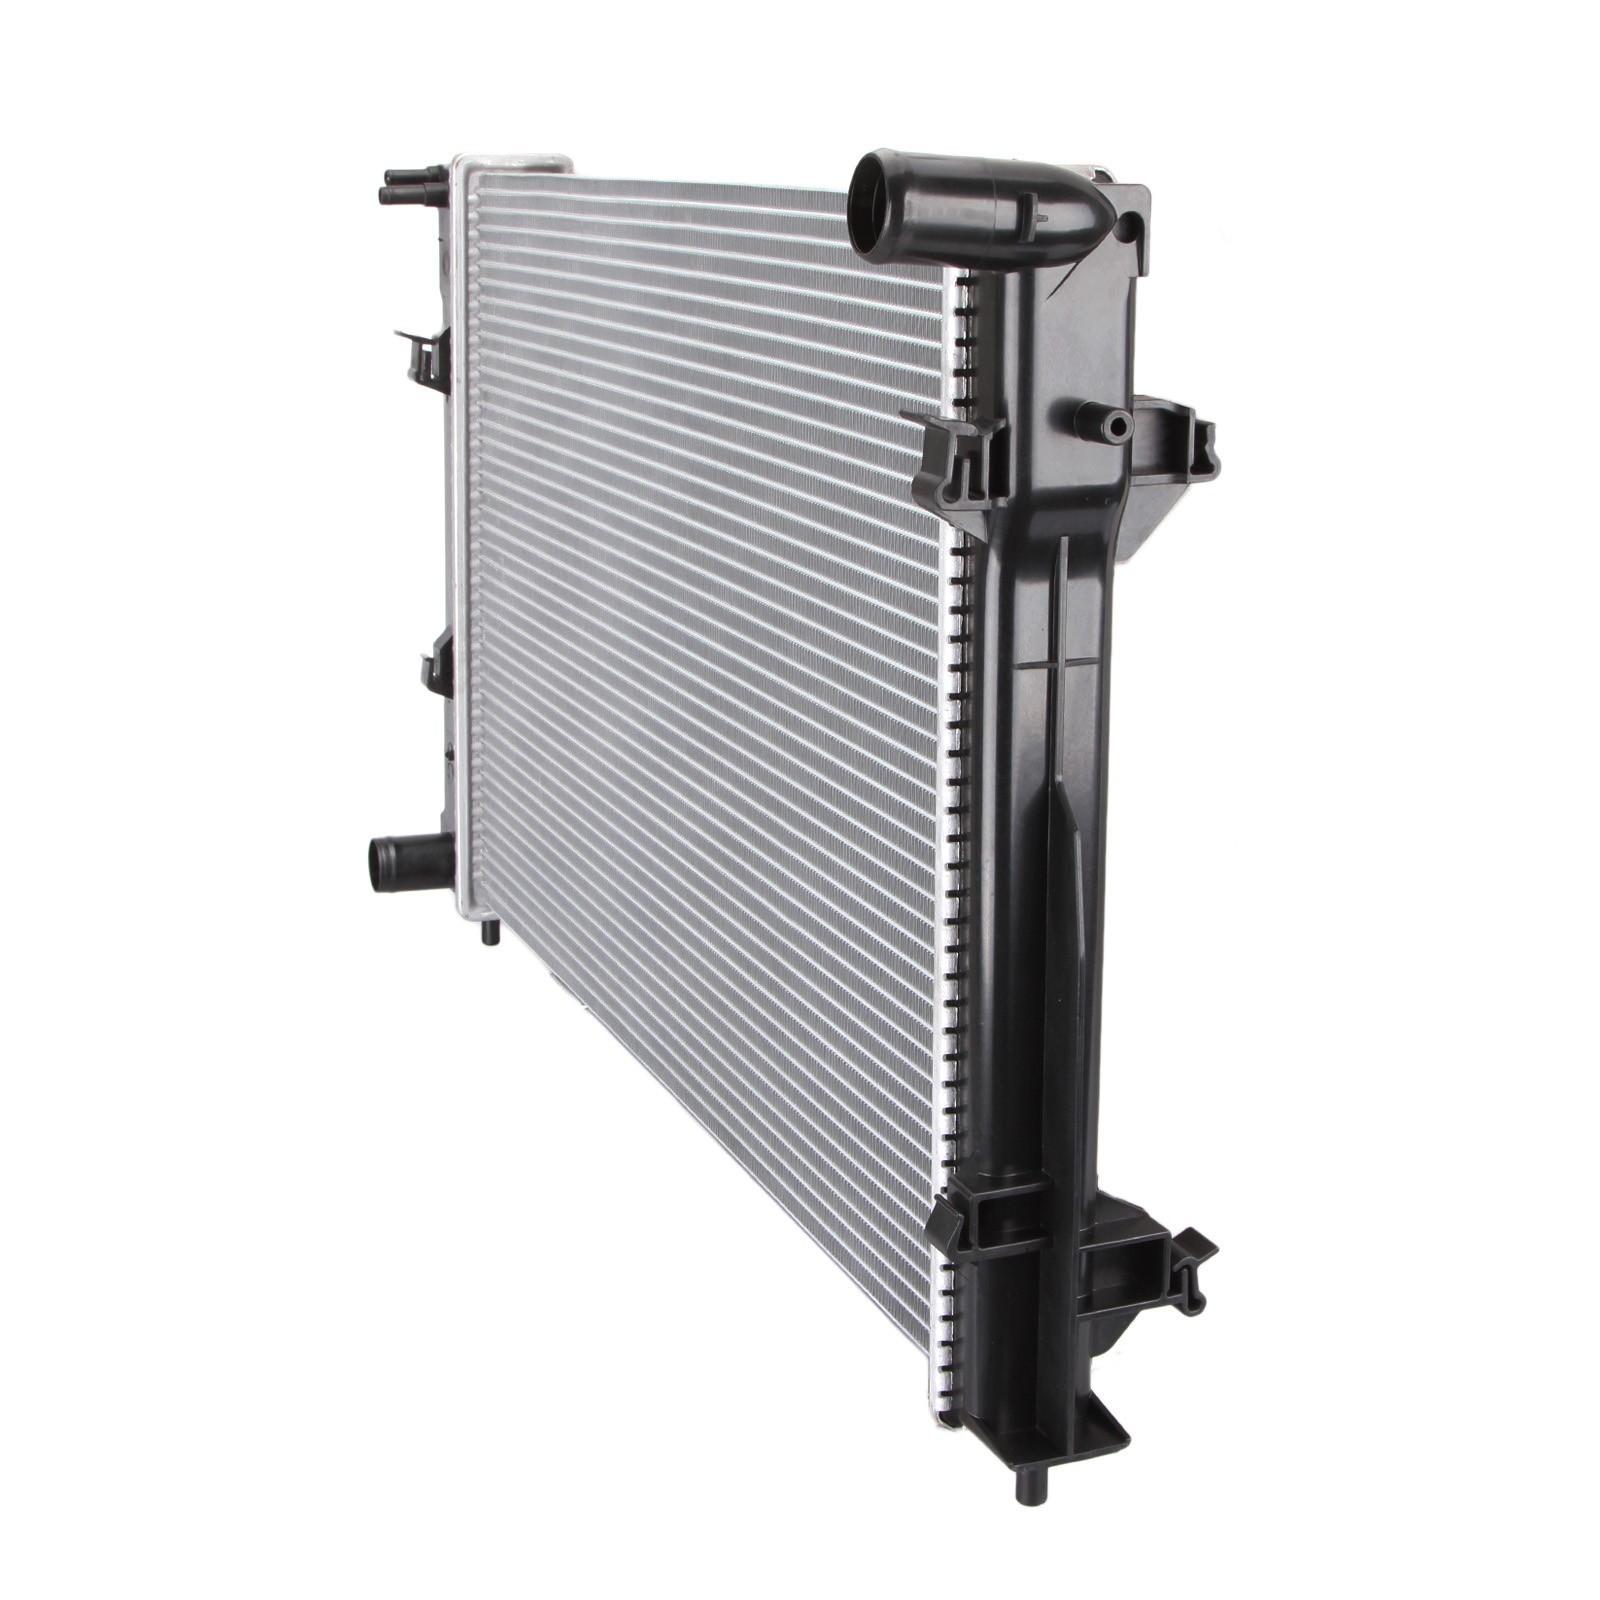 holden radiators for sale ve 32mm 2003 Dromedary Brand company